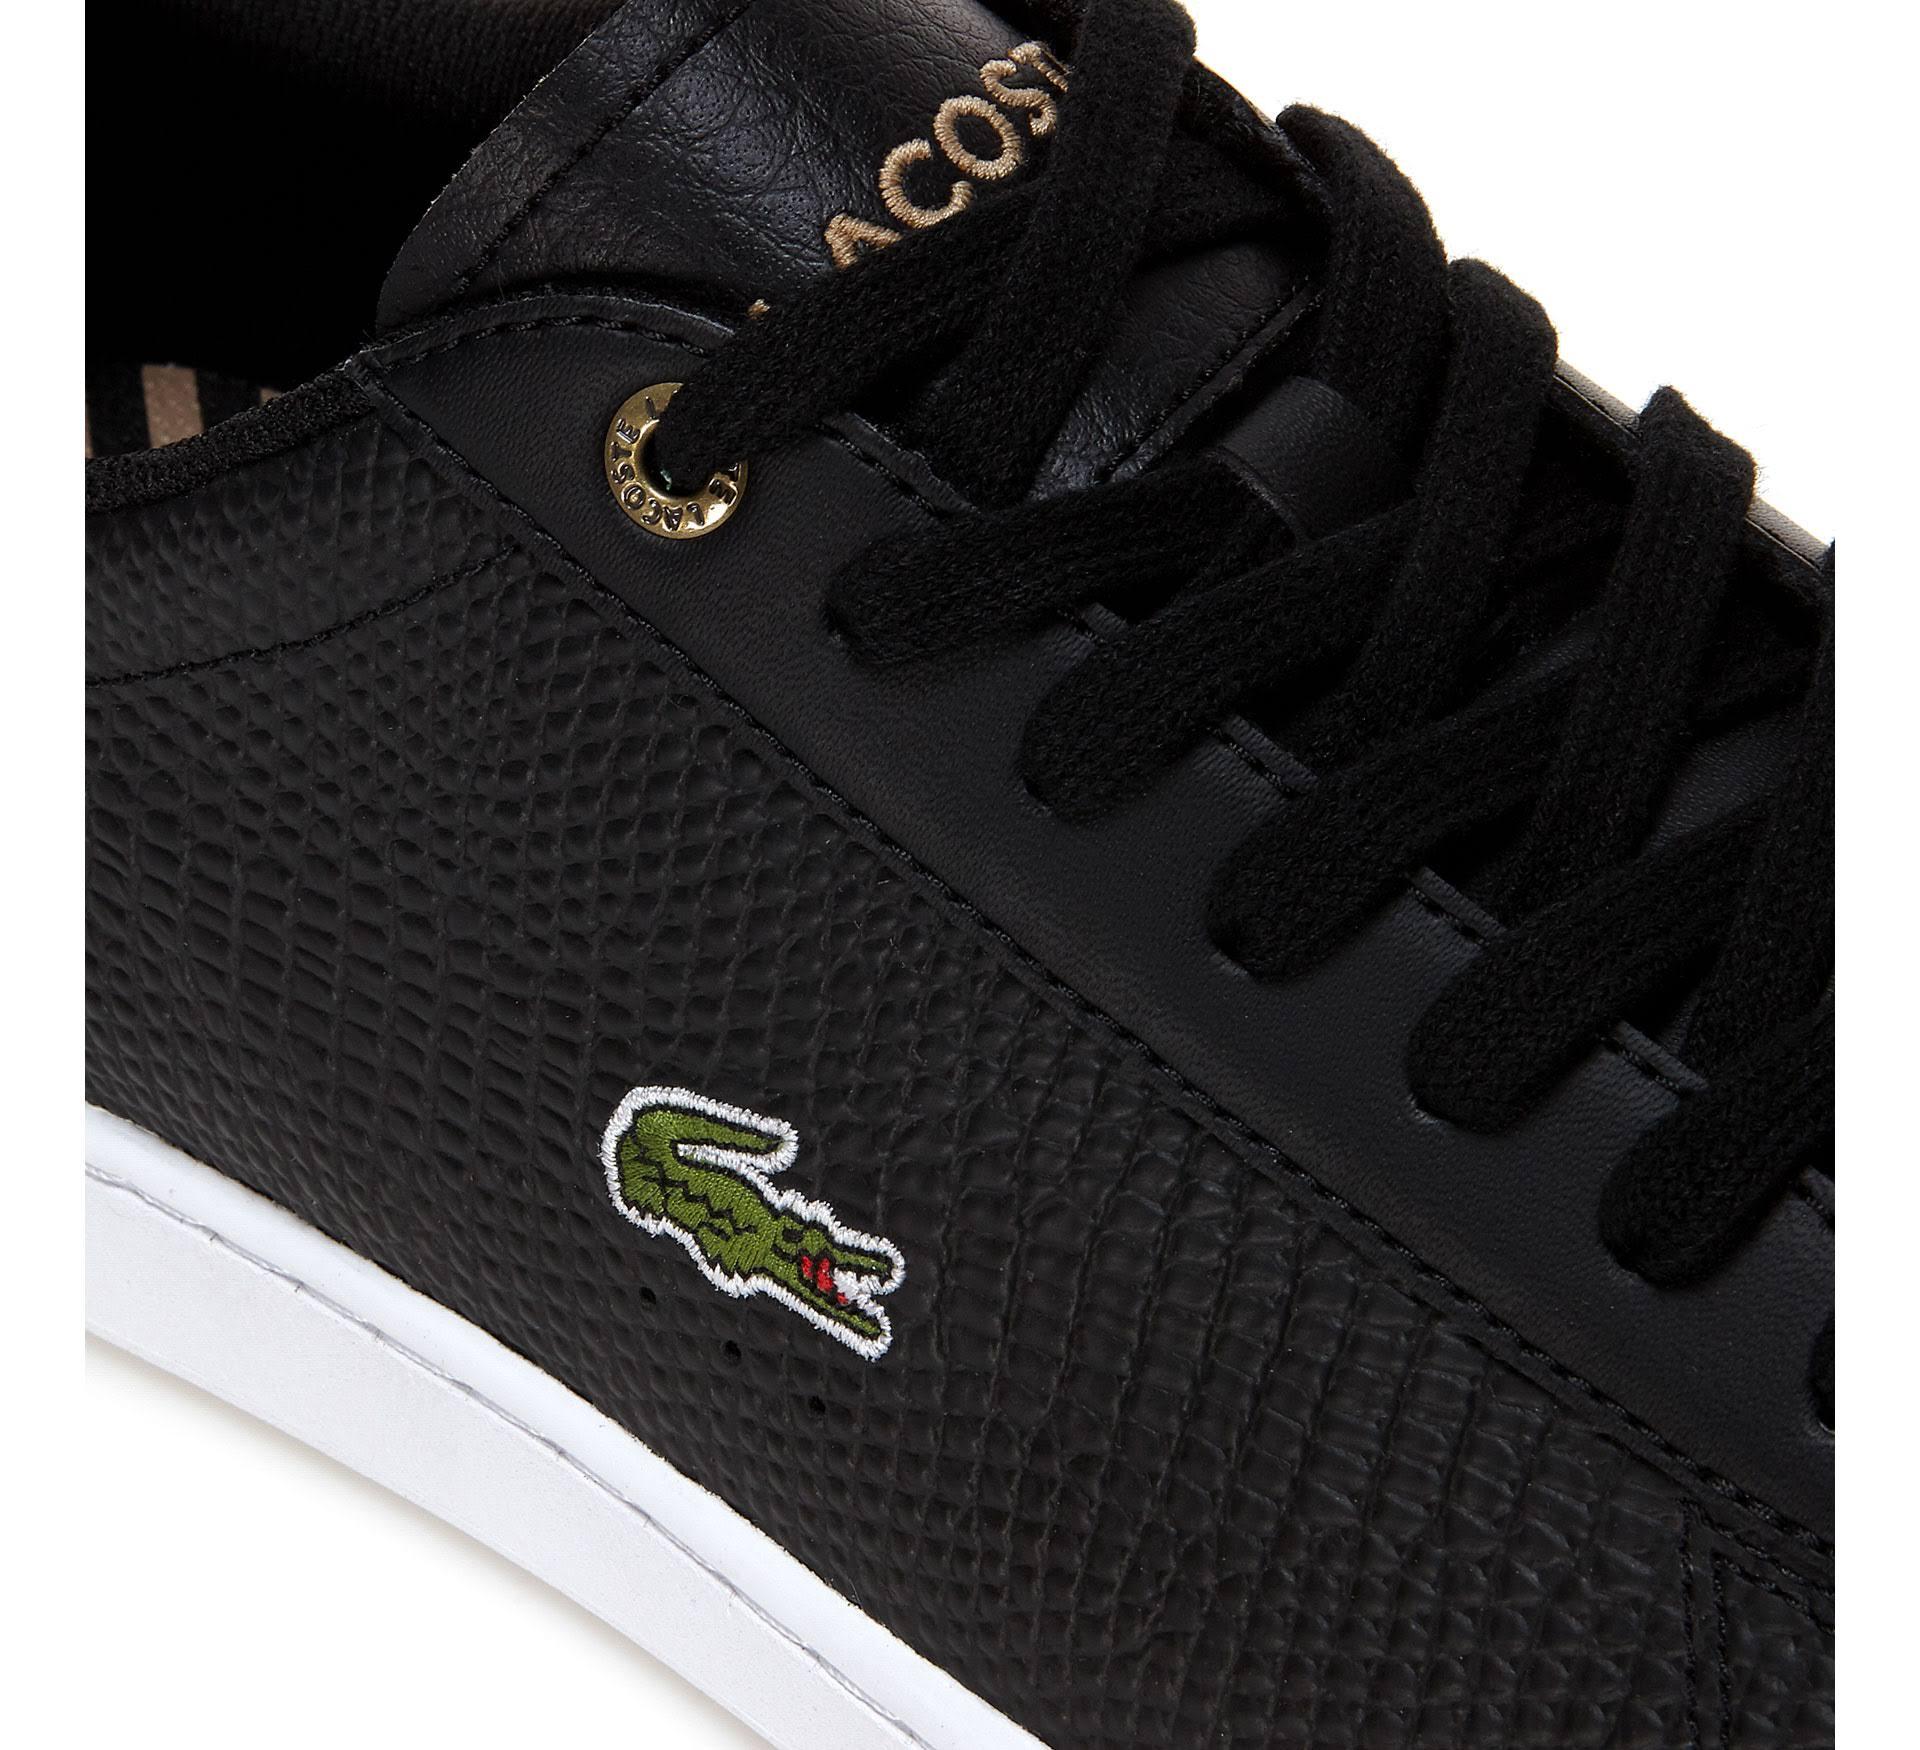 Sneakers Spm Carnaby Zwart 118 Heren 2 Lacoste Evo Wit xq47wWRzB